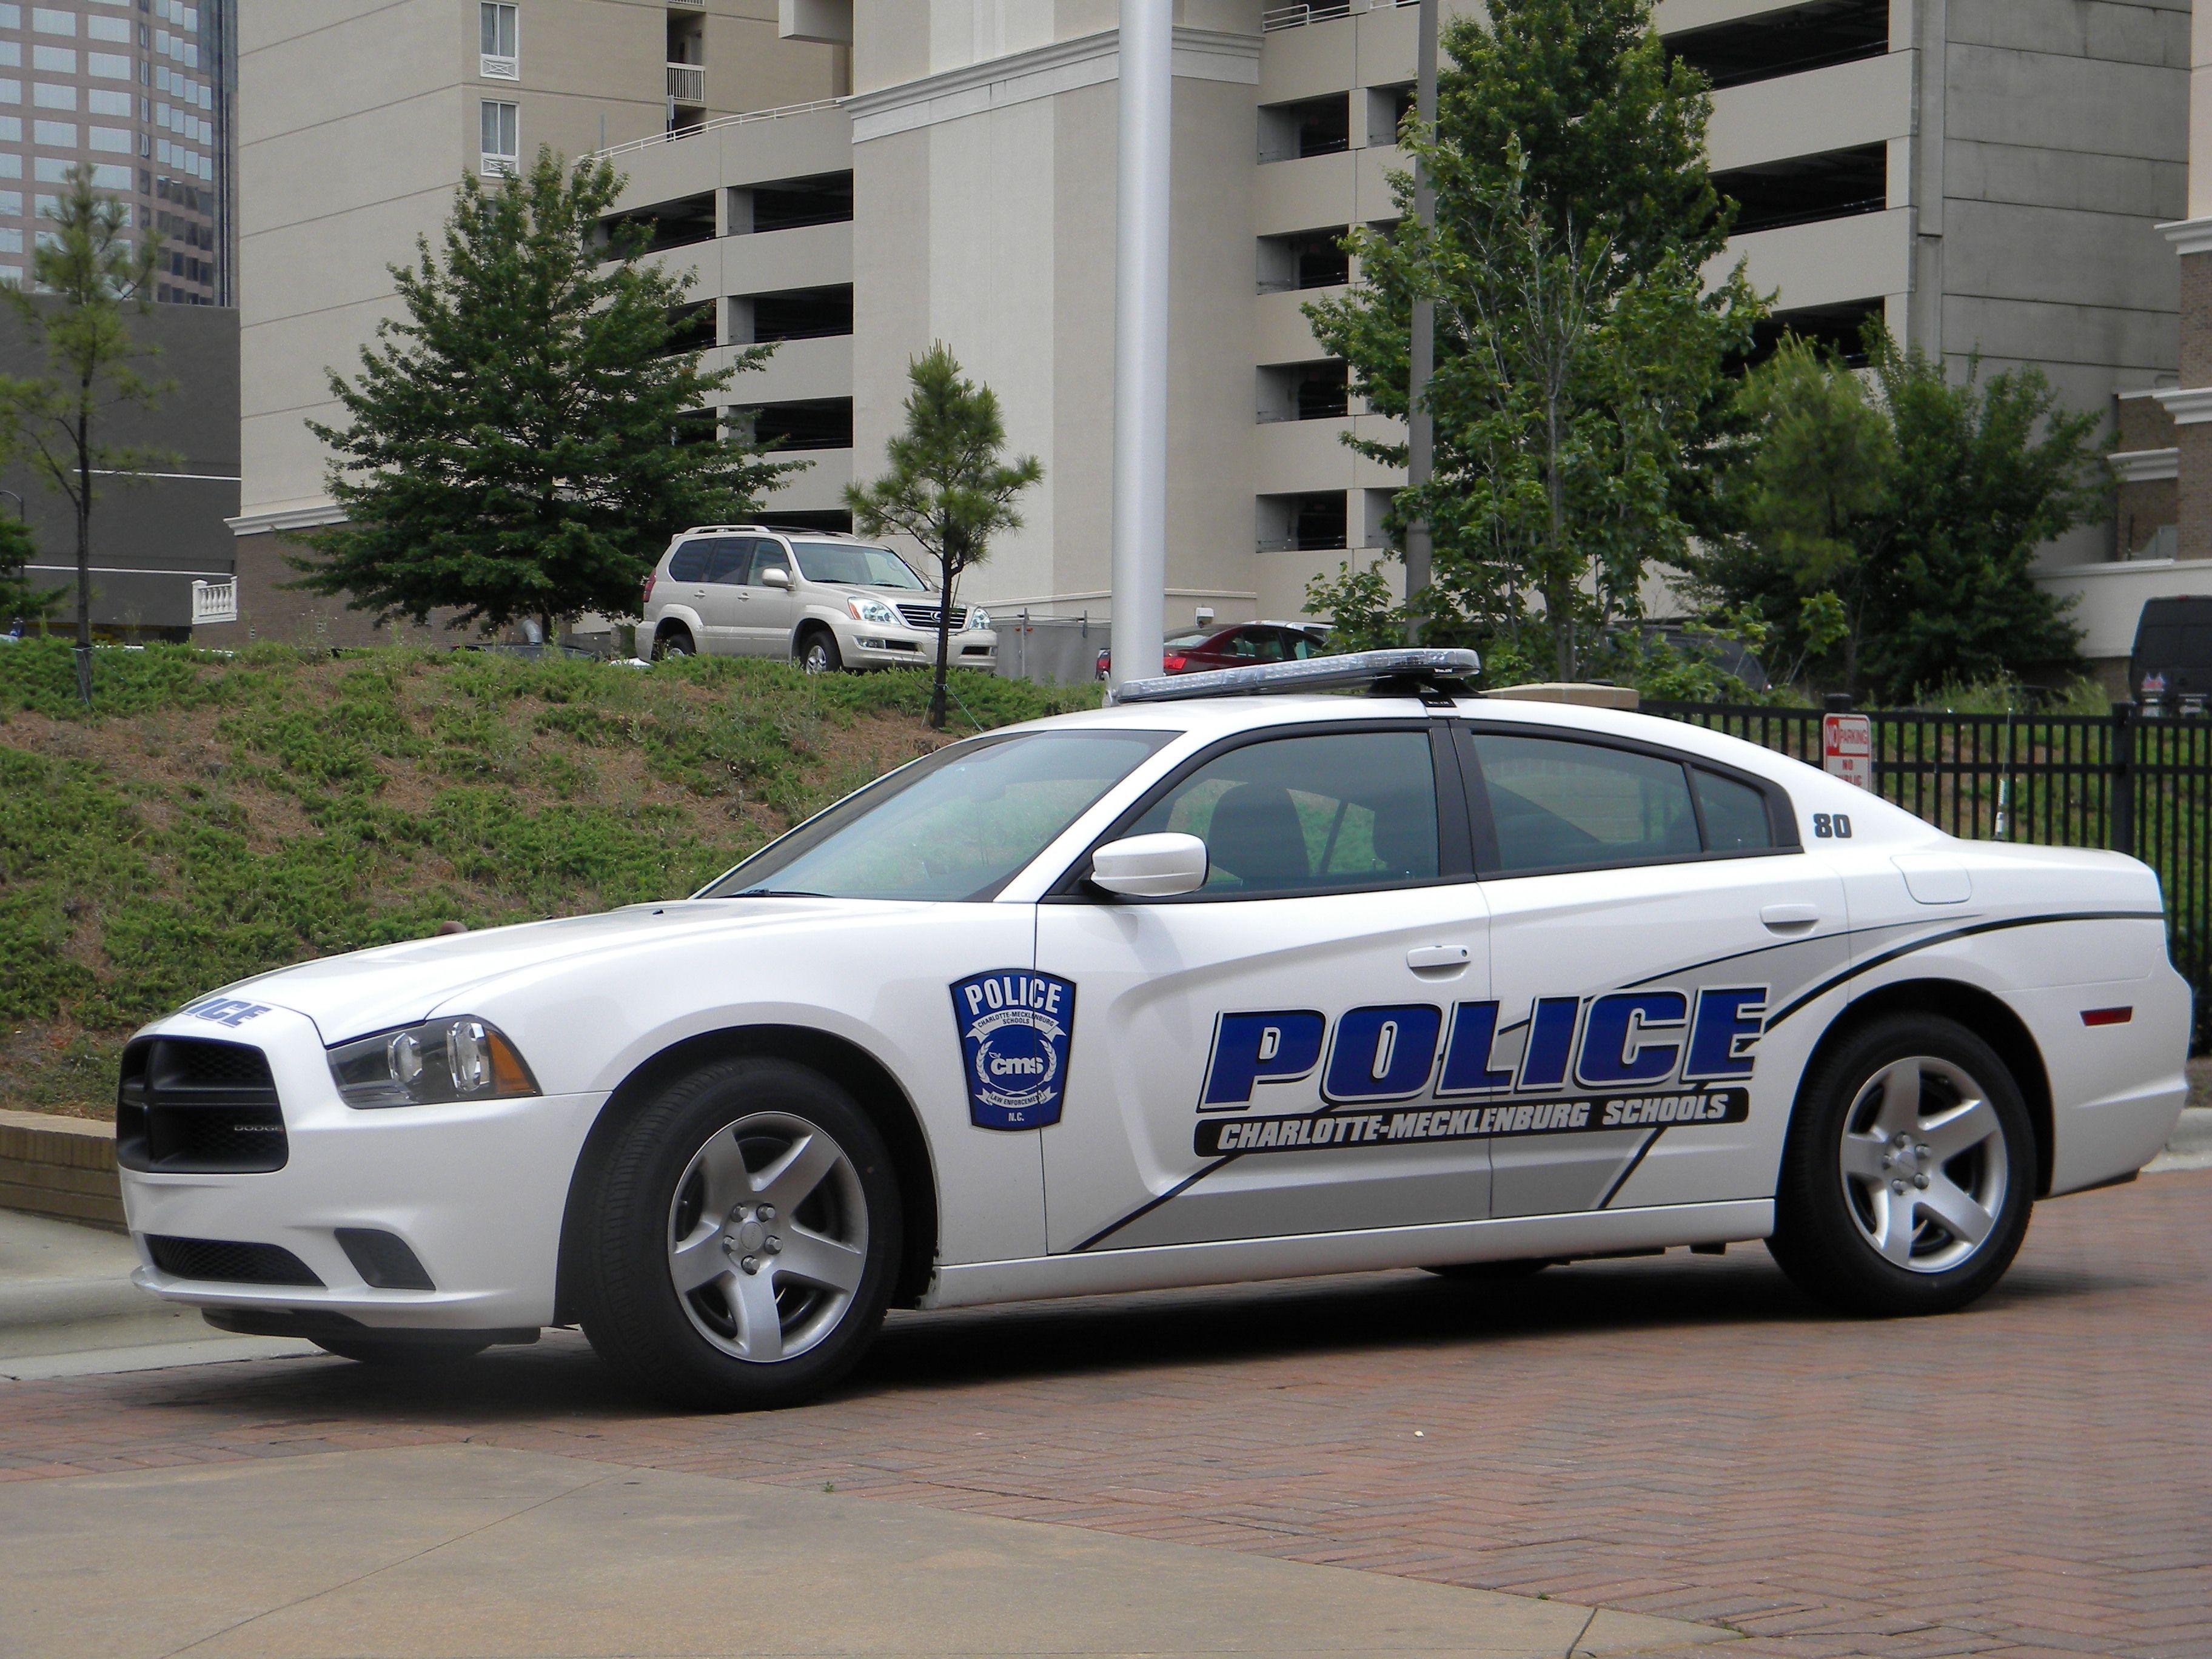 Charlotte-Mecklenburg Schools Police Department Charger